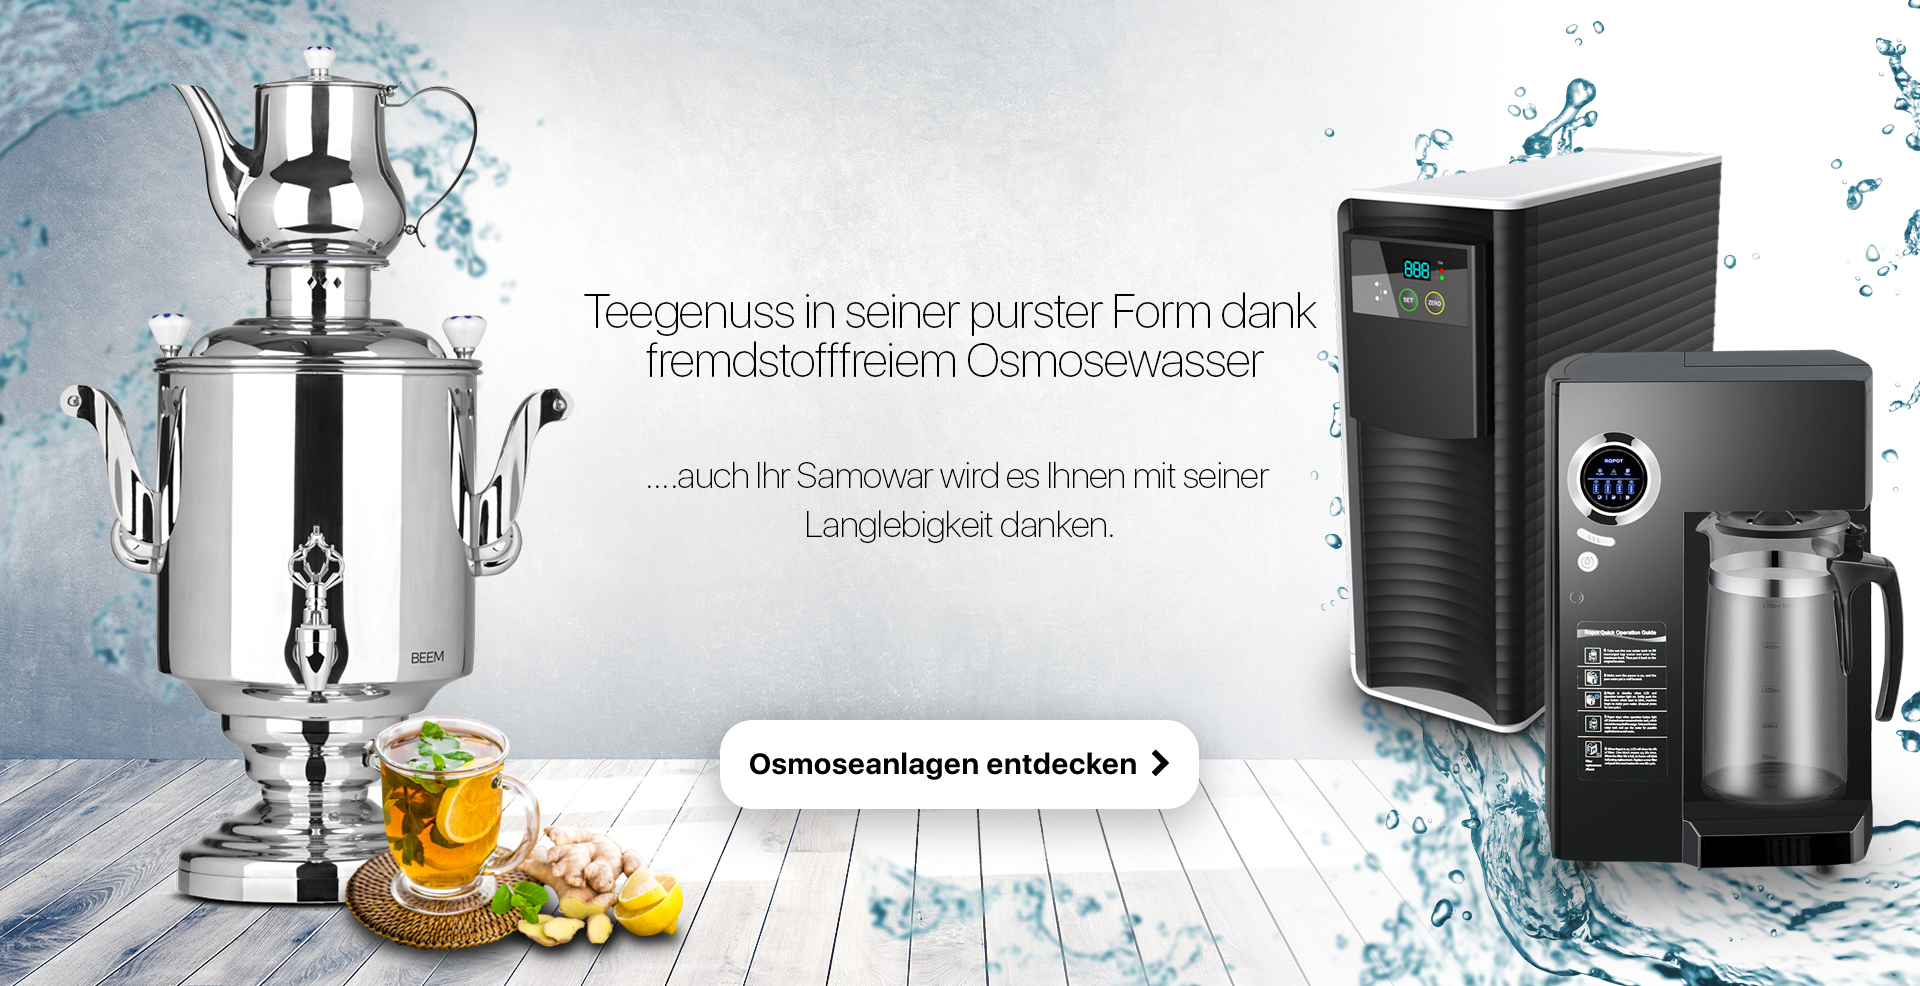 Osmosewasser_ohne-Samoware_07133